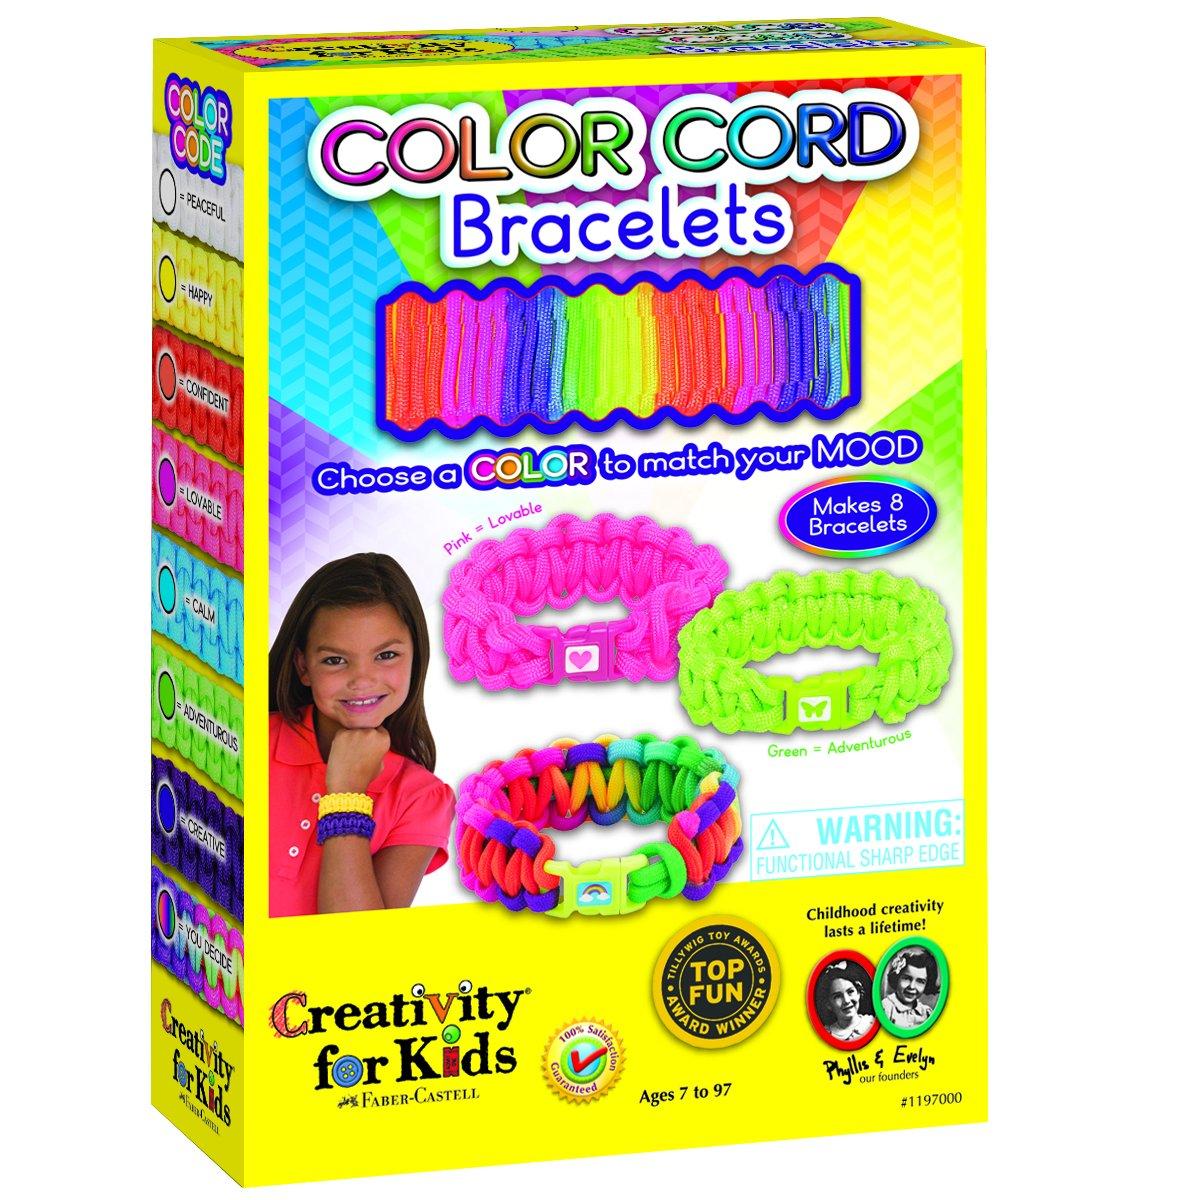 Creativity For Kids Paracord Bracelet Kit - Amazon com creativity for kids color cord bracelets makes 8 paracord bracelets toys games